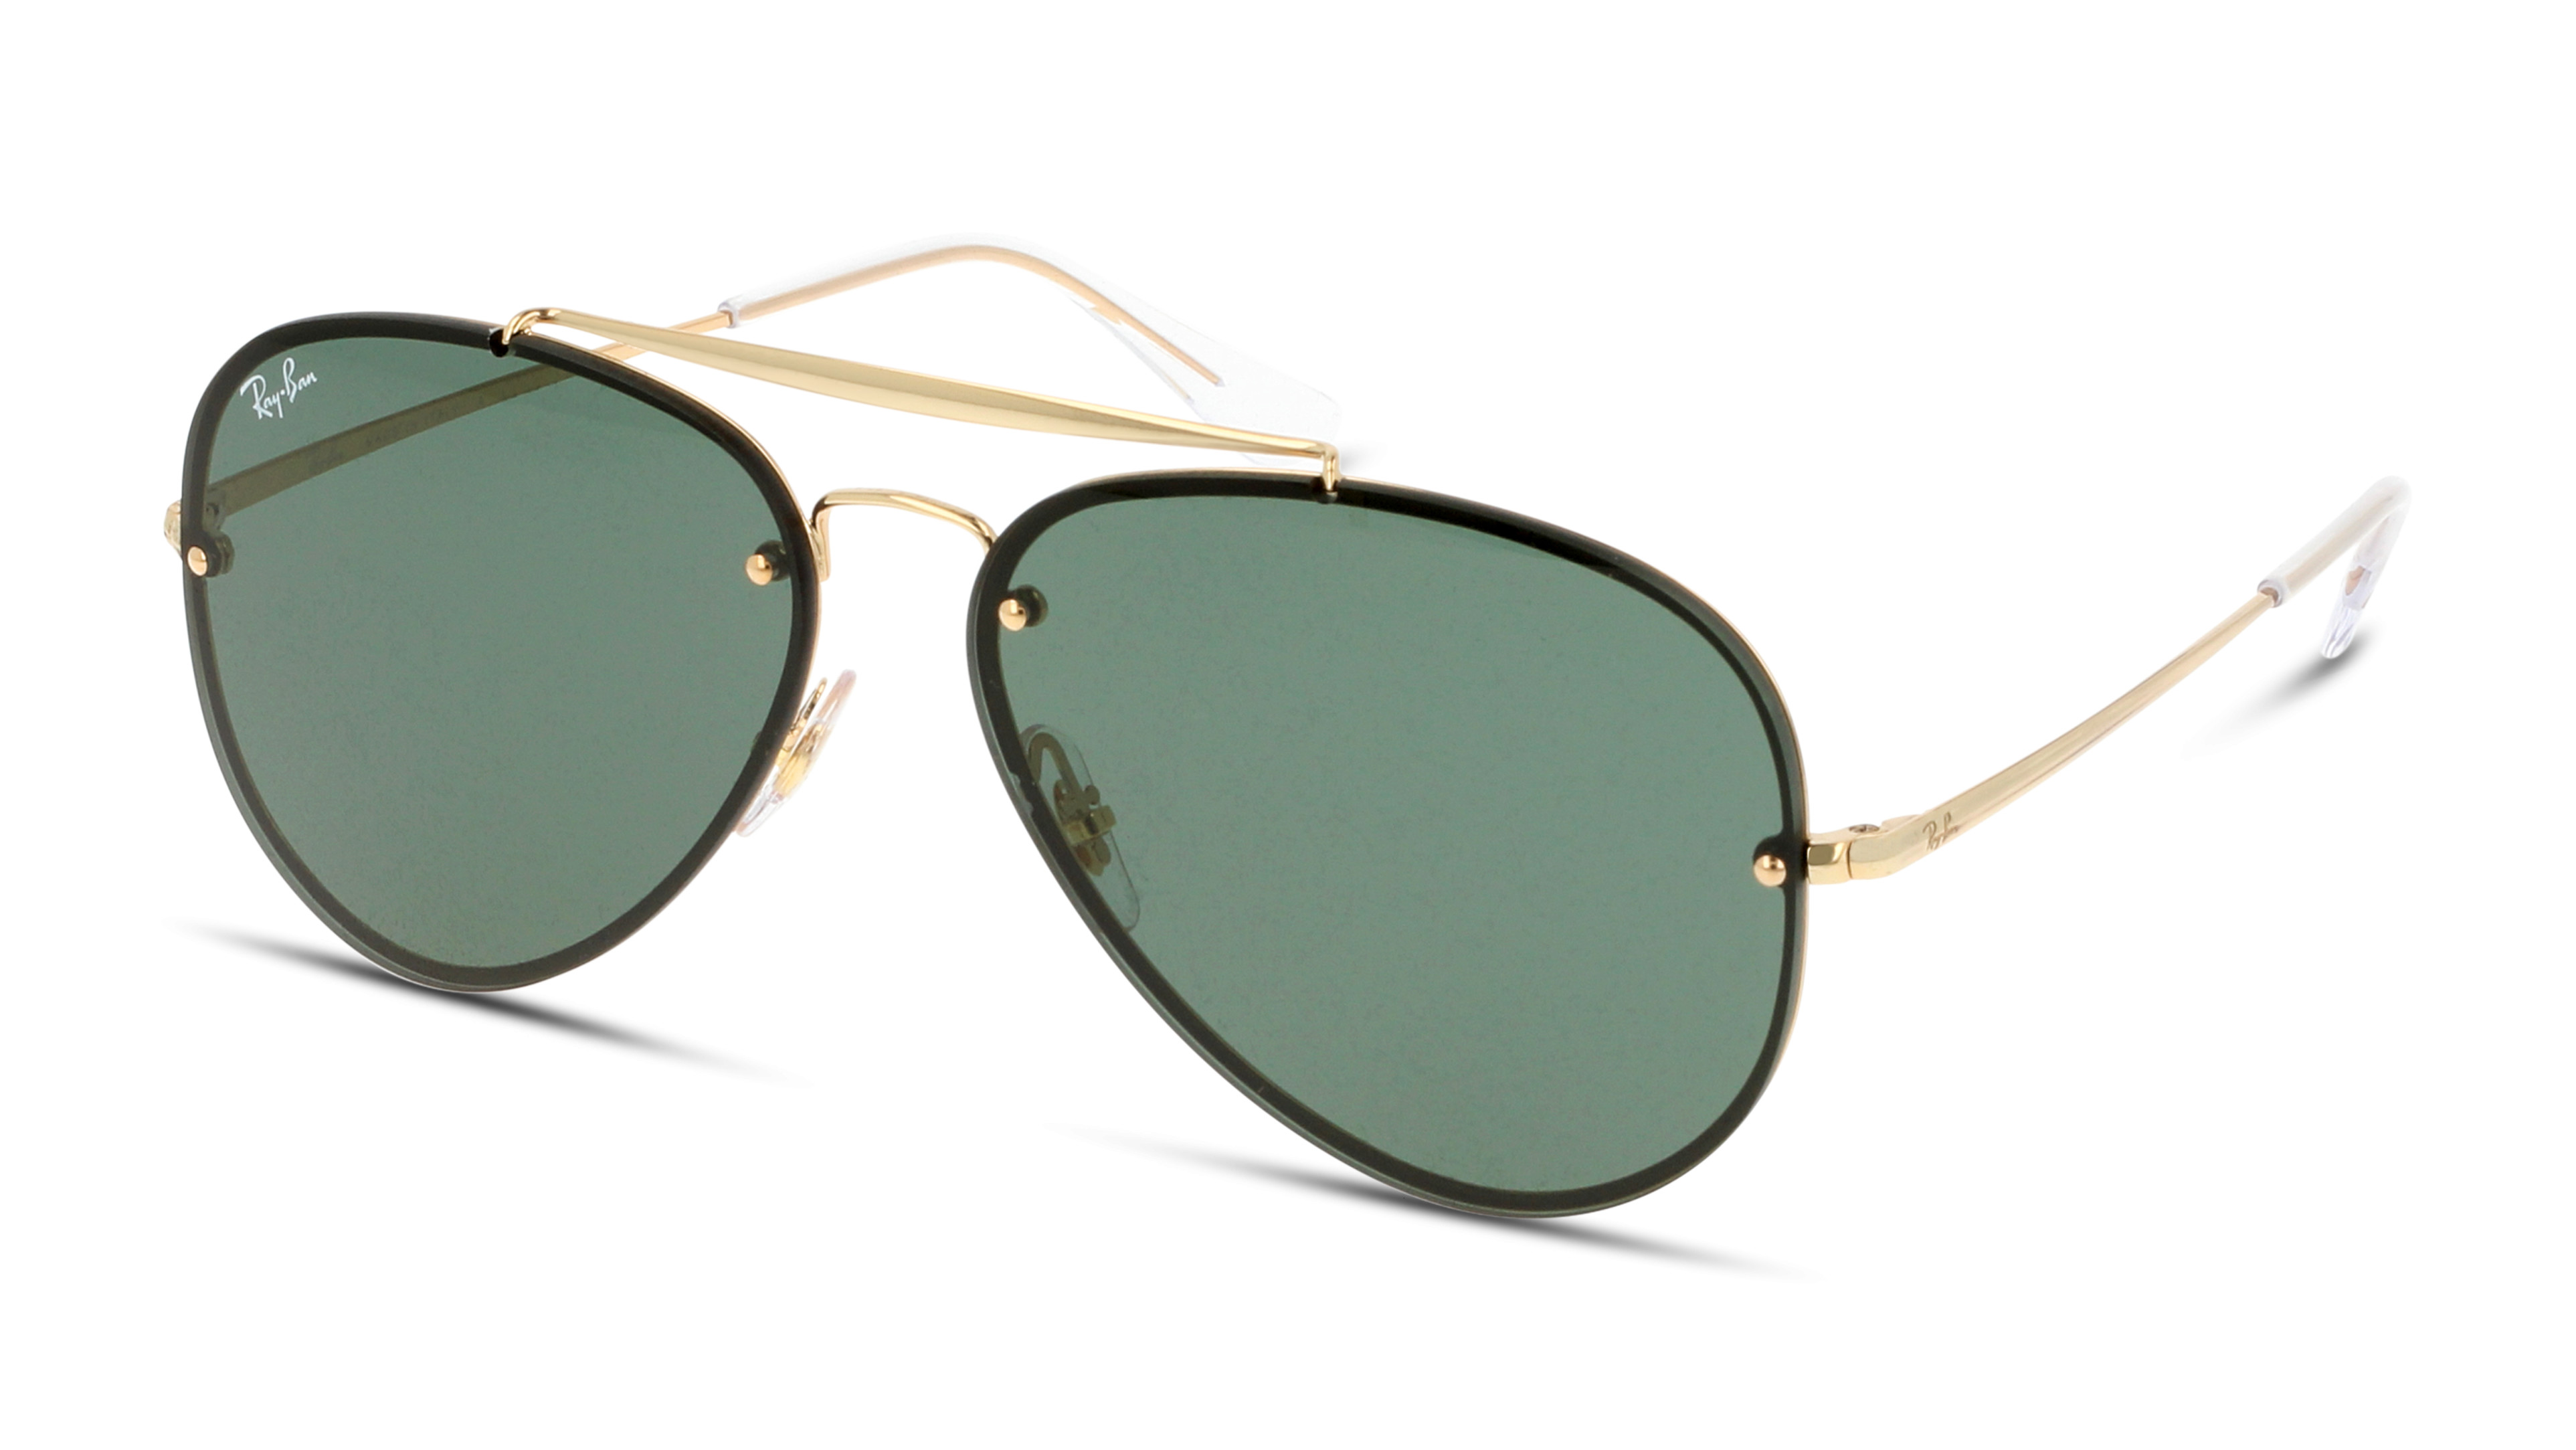 8053672830262-angle-01-rayban-glasses-eyewear-pair